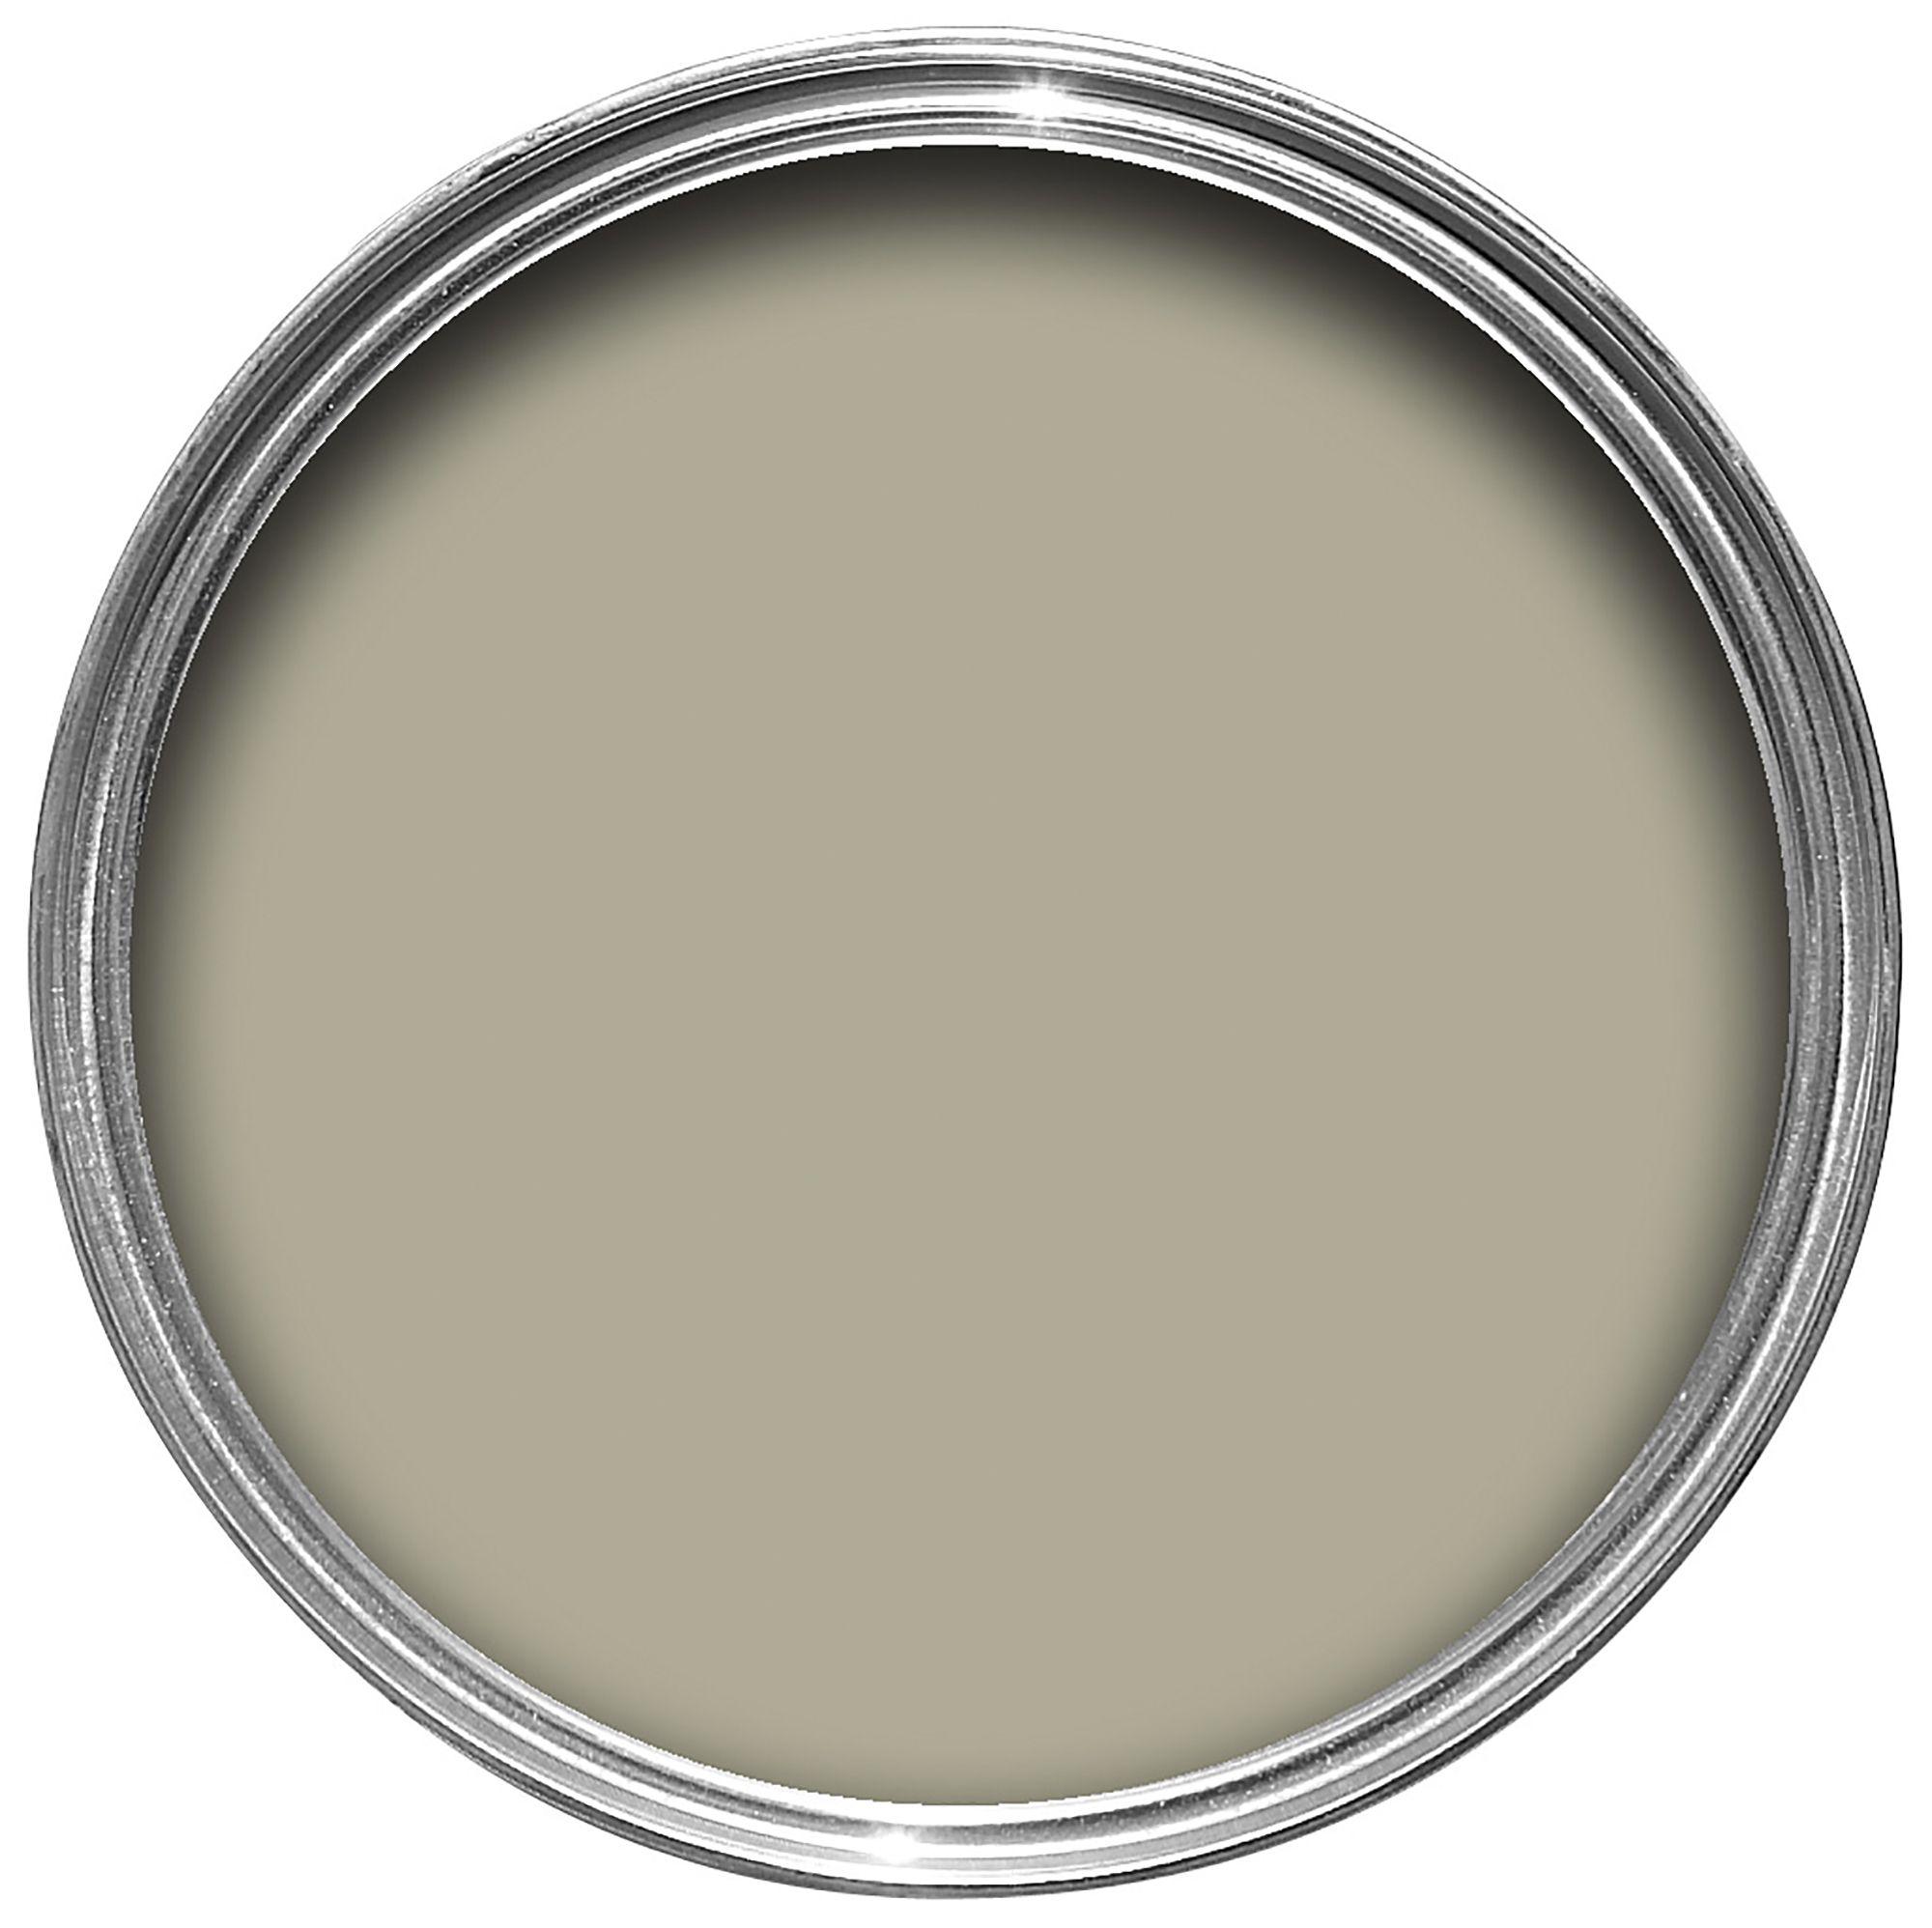 Dulux Weathershield Exterior Hazelnut Truffle Satin Paint 750ml Departments Diy At B Q